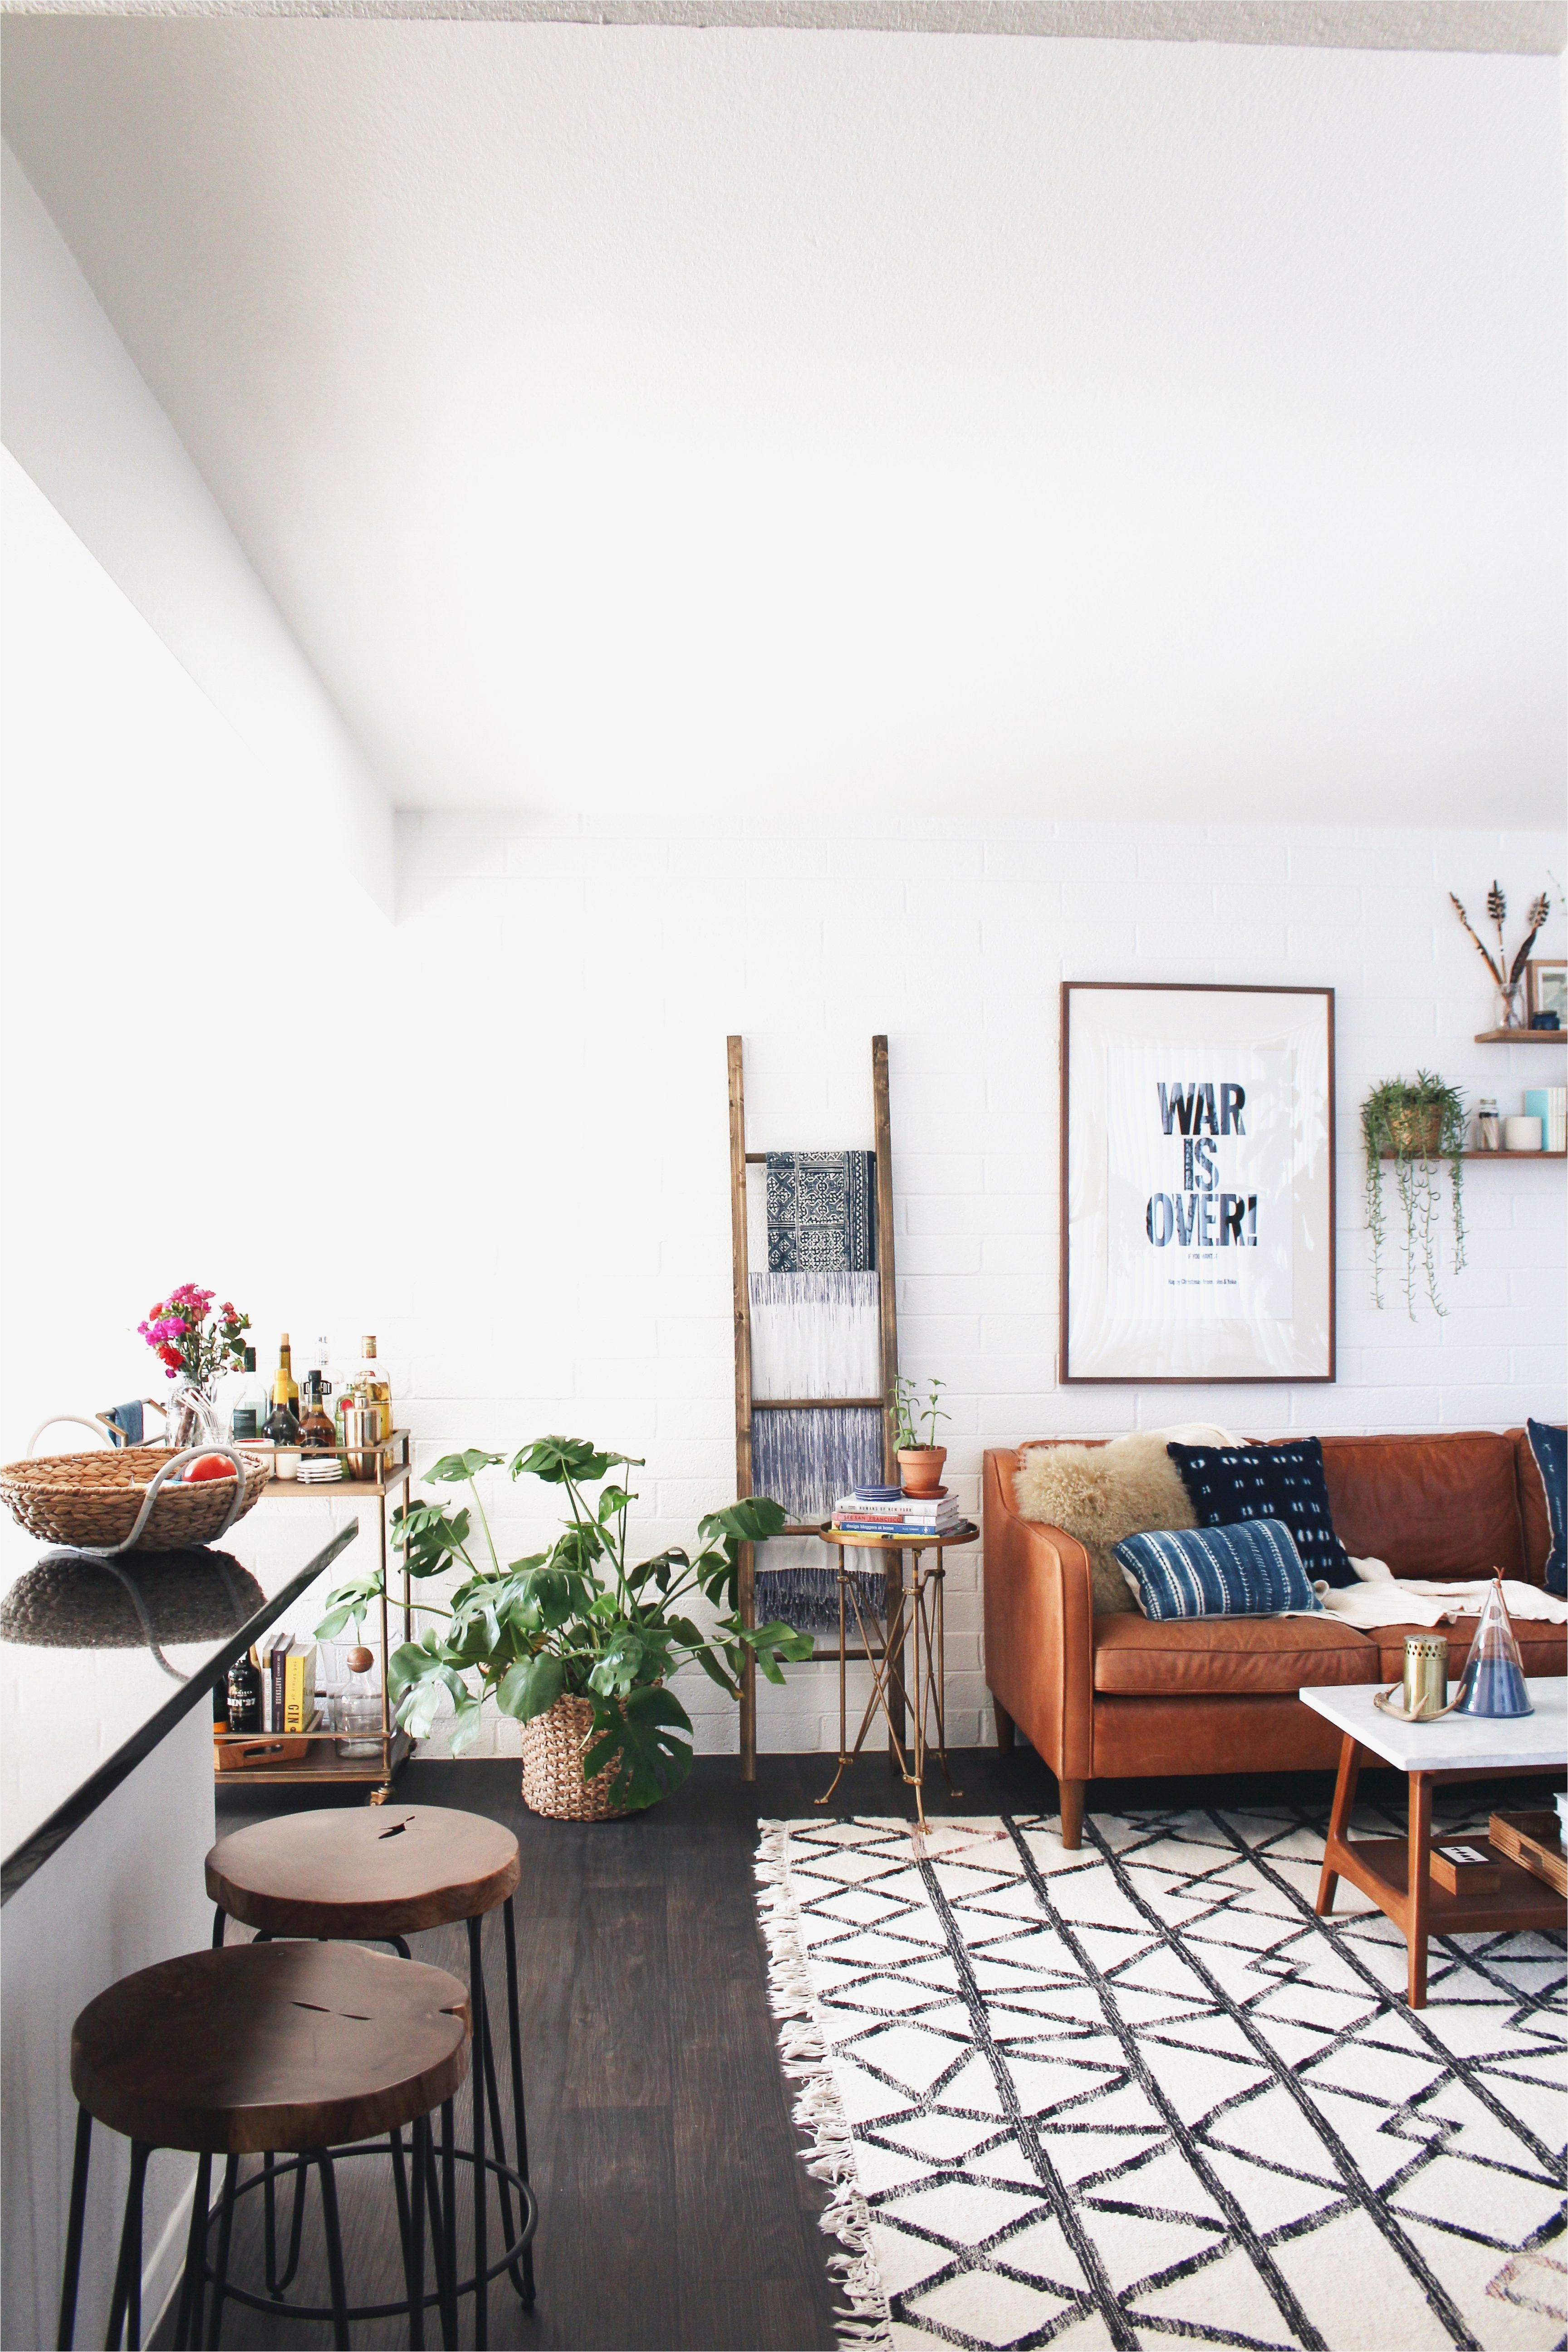 furniture pampa furniture pampa furniture 0d furnitures from home interior decor ideas source mjarlon